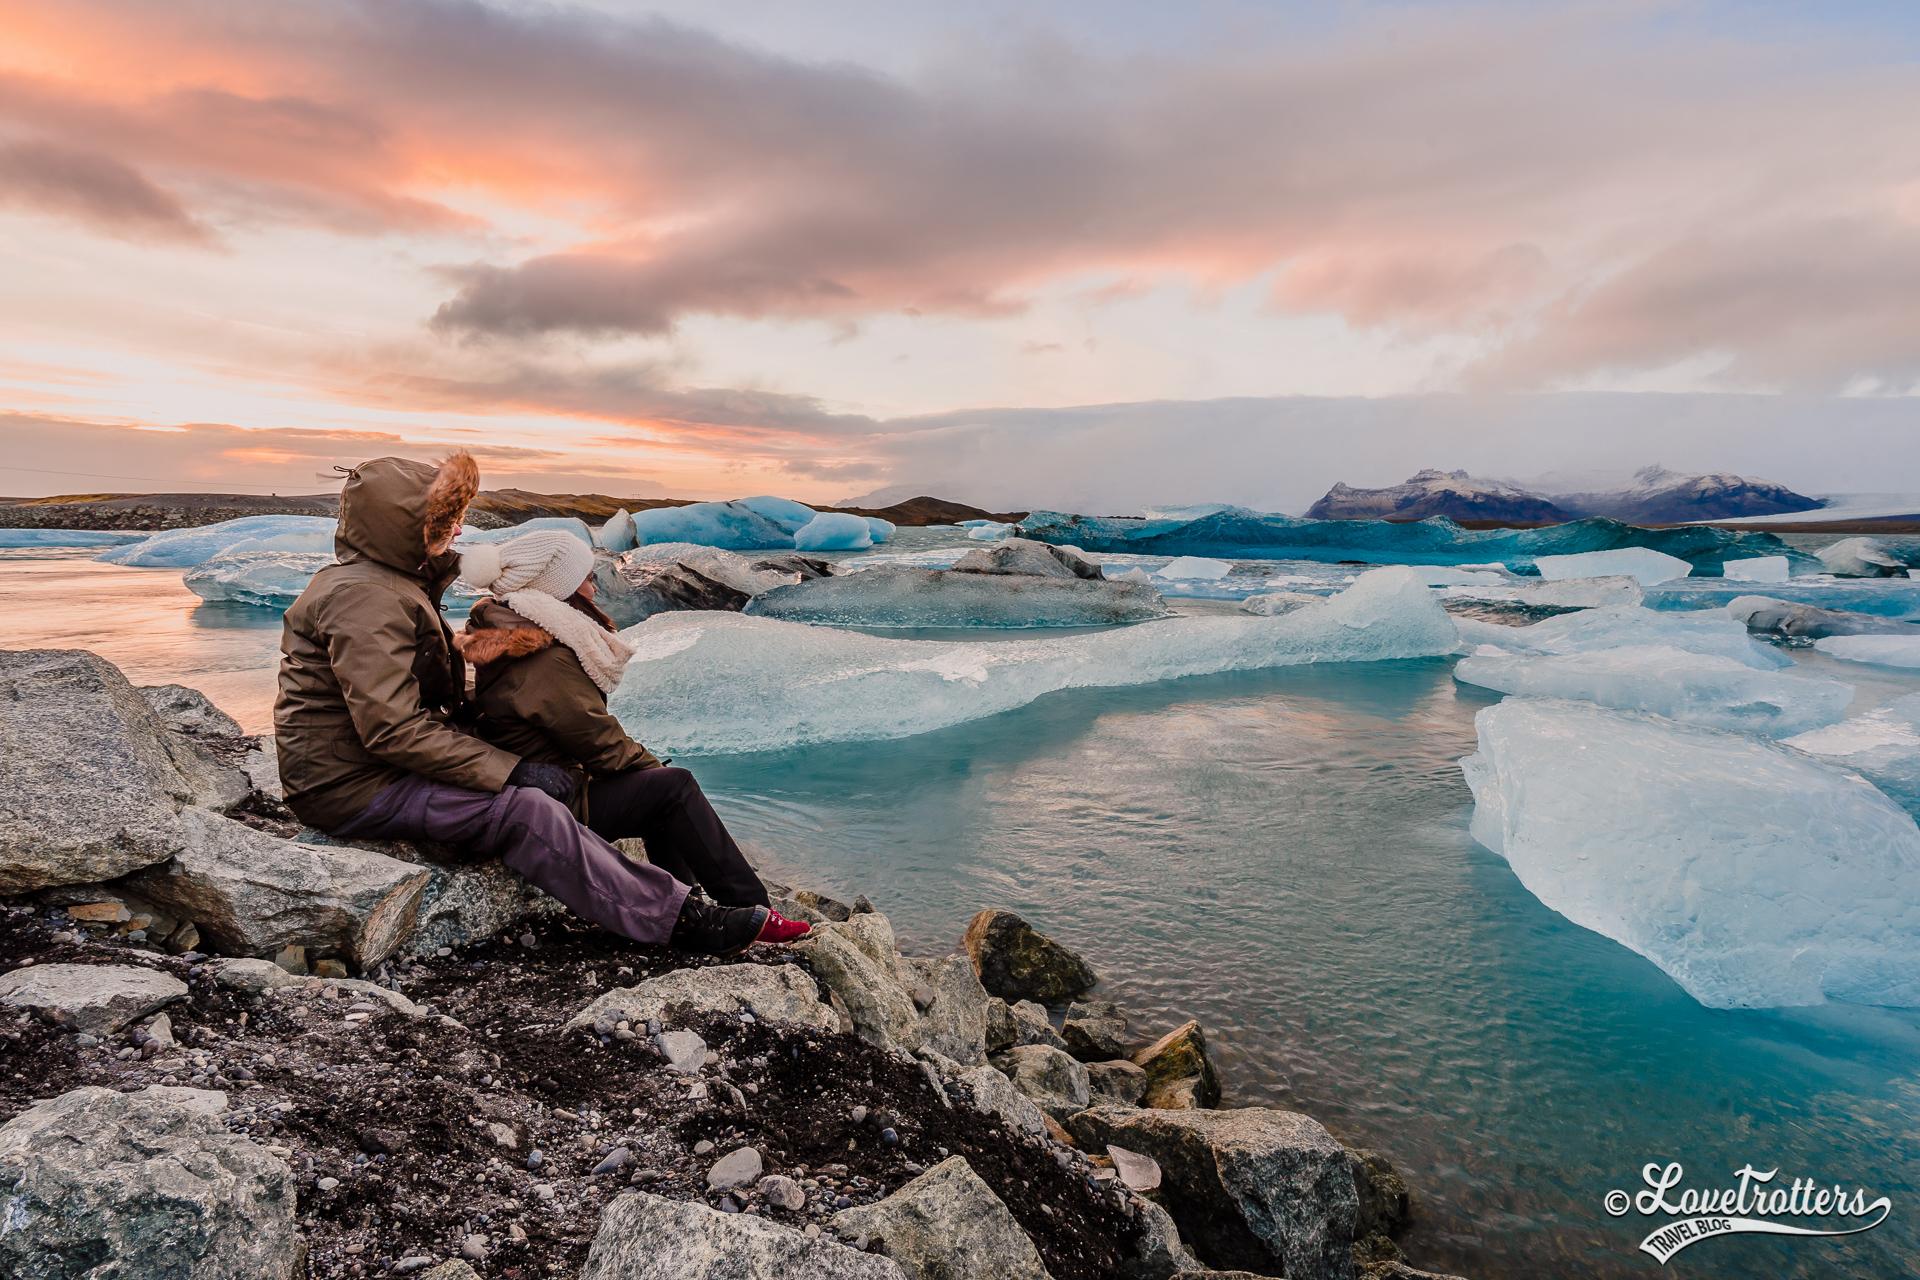 Voyage en amoureux en Islande l'hiver